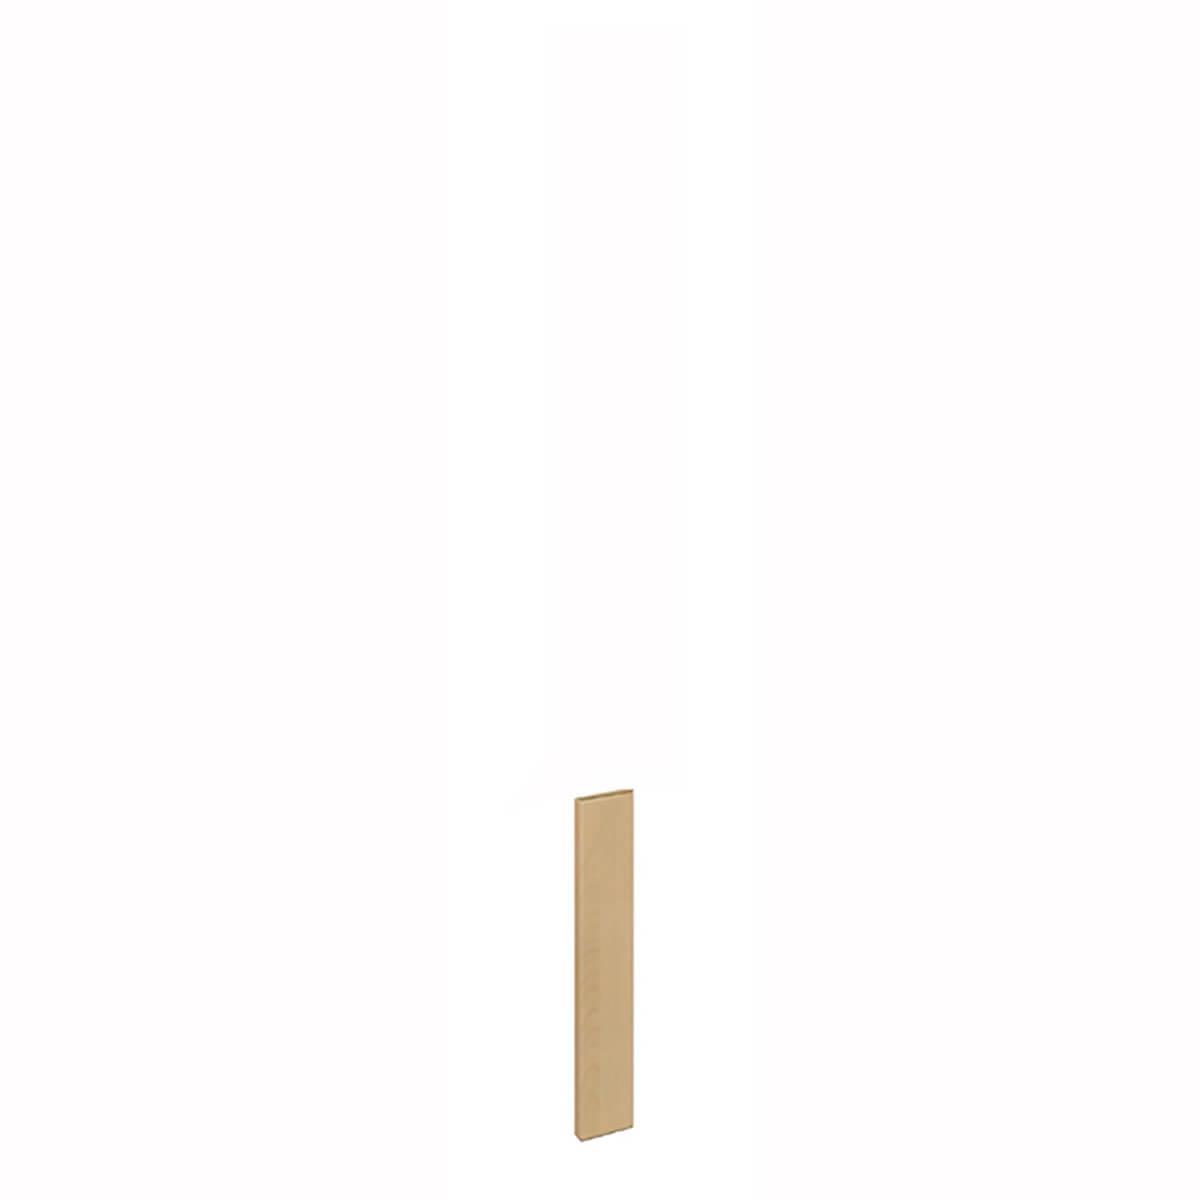 Mittelpfosten 57cm DELUXE Debreuyn Buche natur geölt